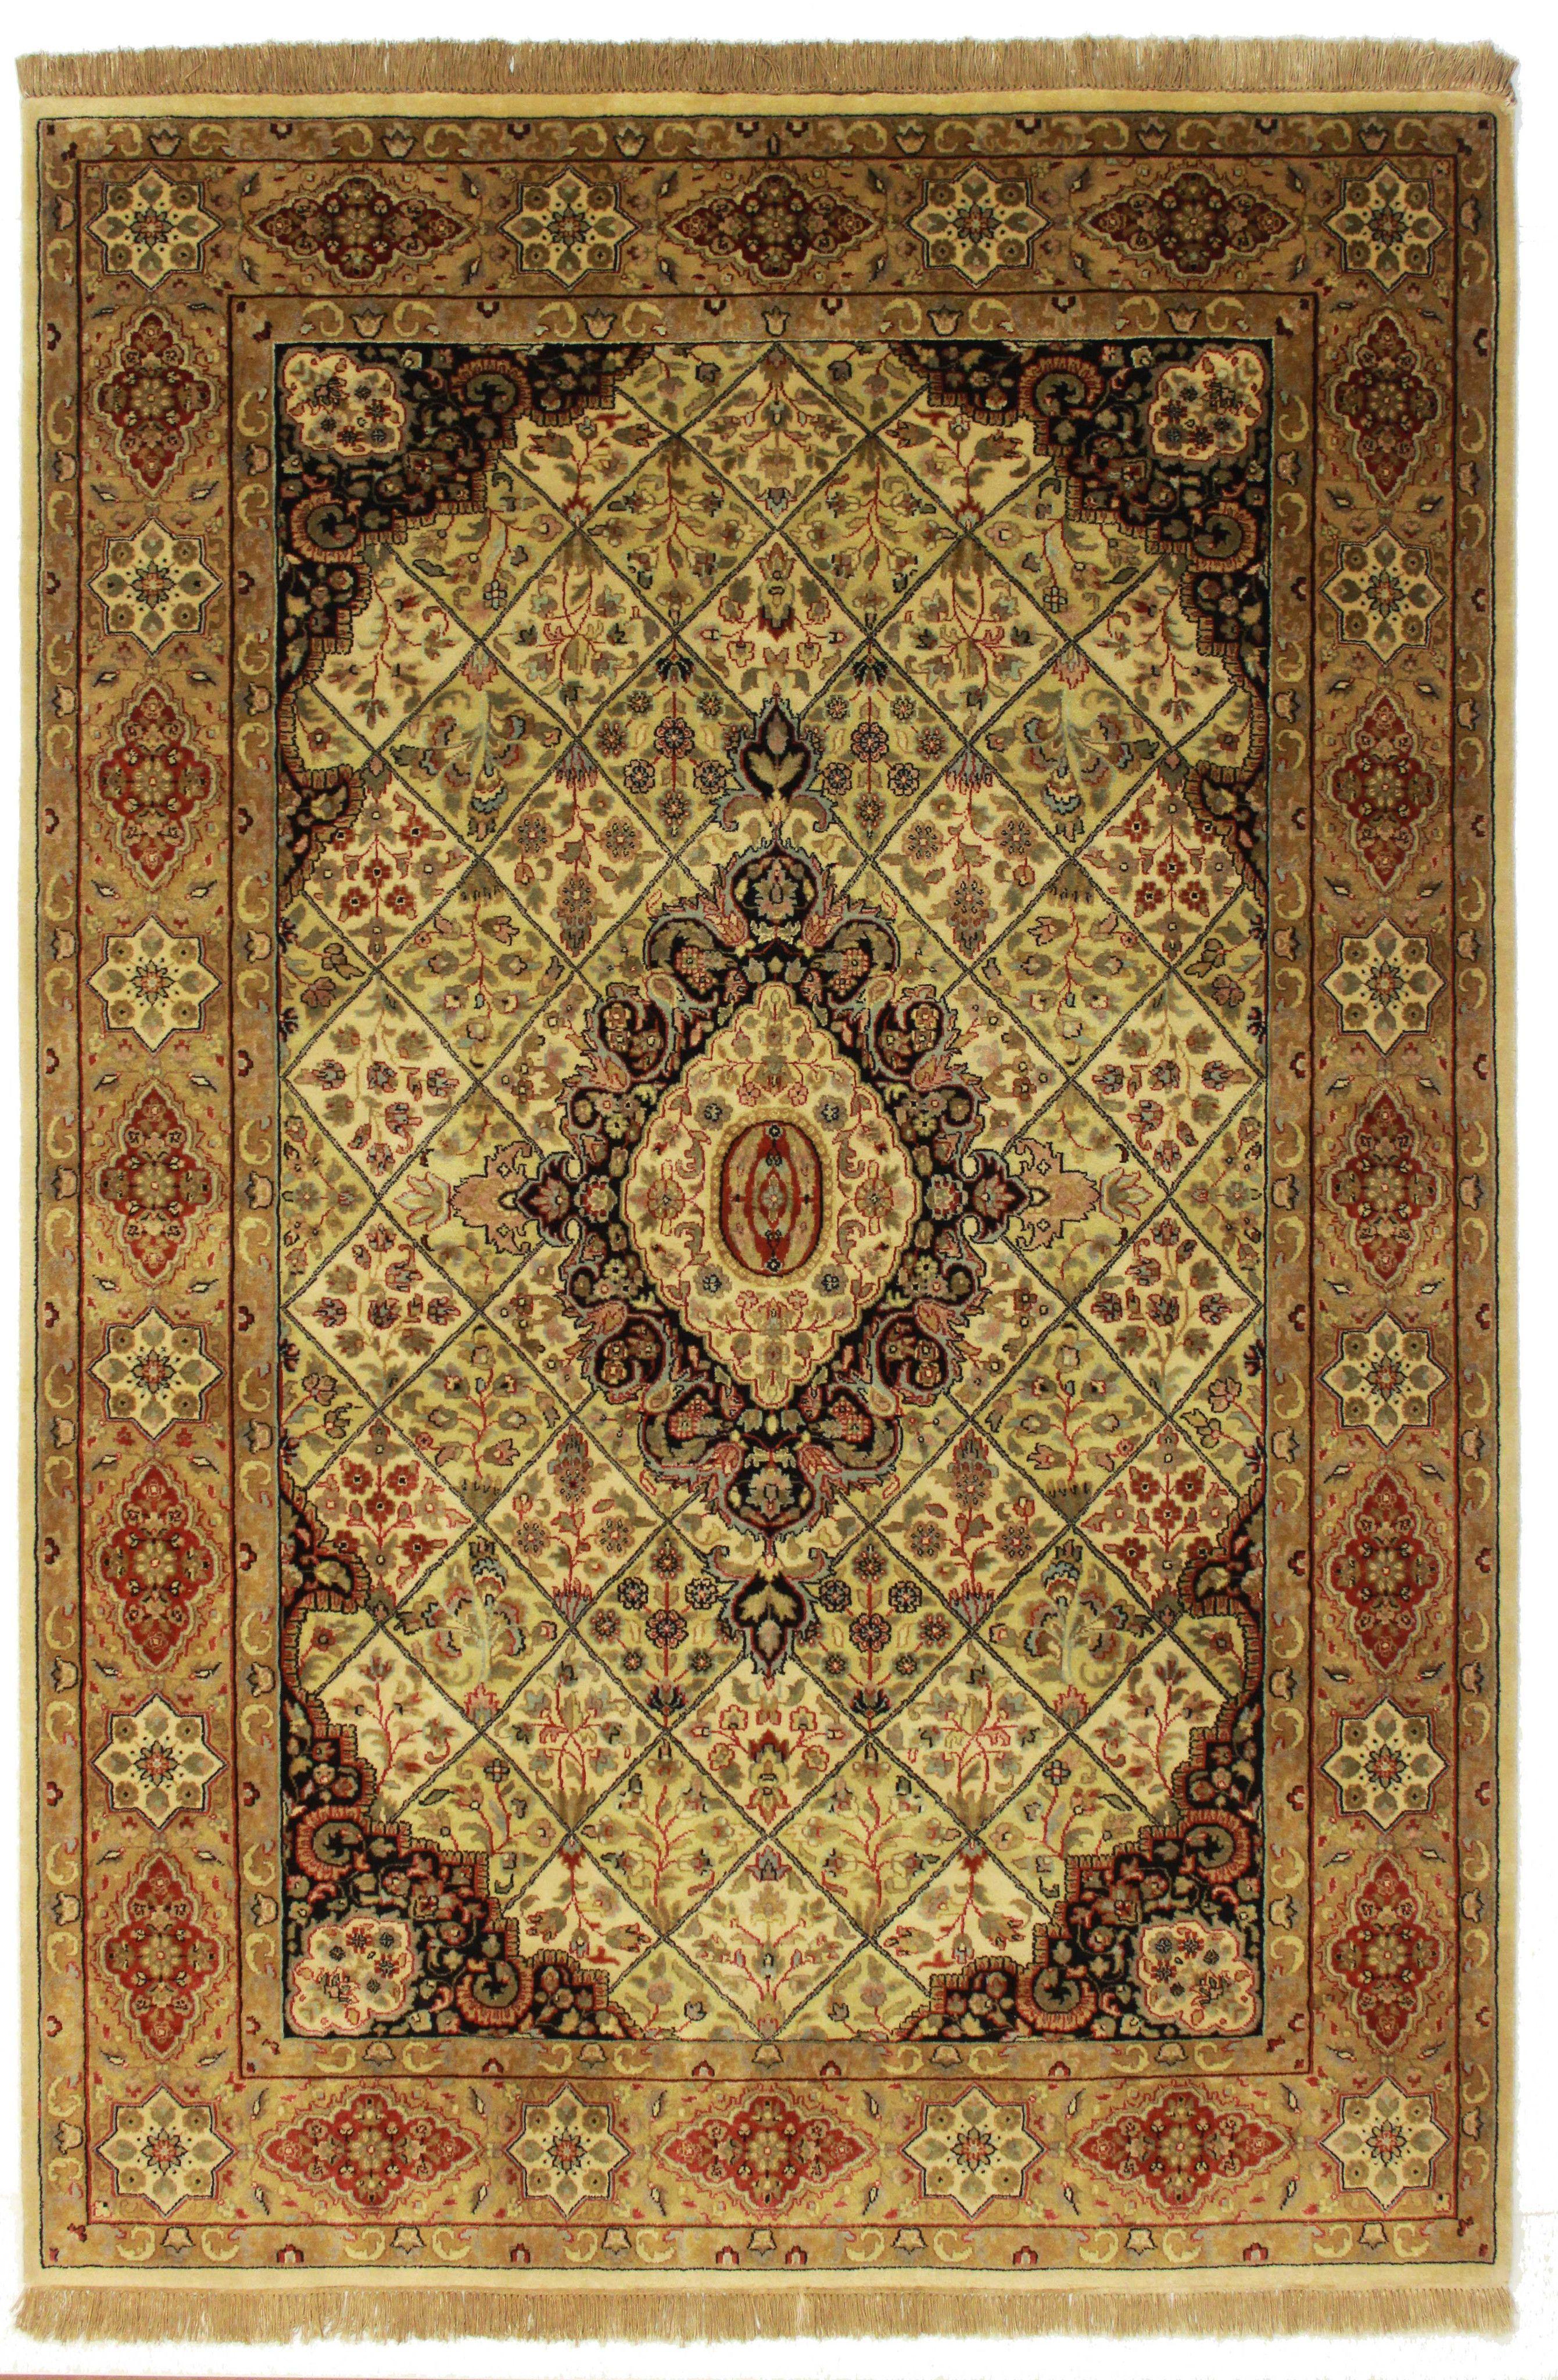 "6' X 8'10"" Persian Style Handmade Rug"